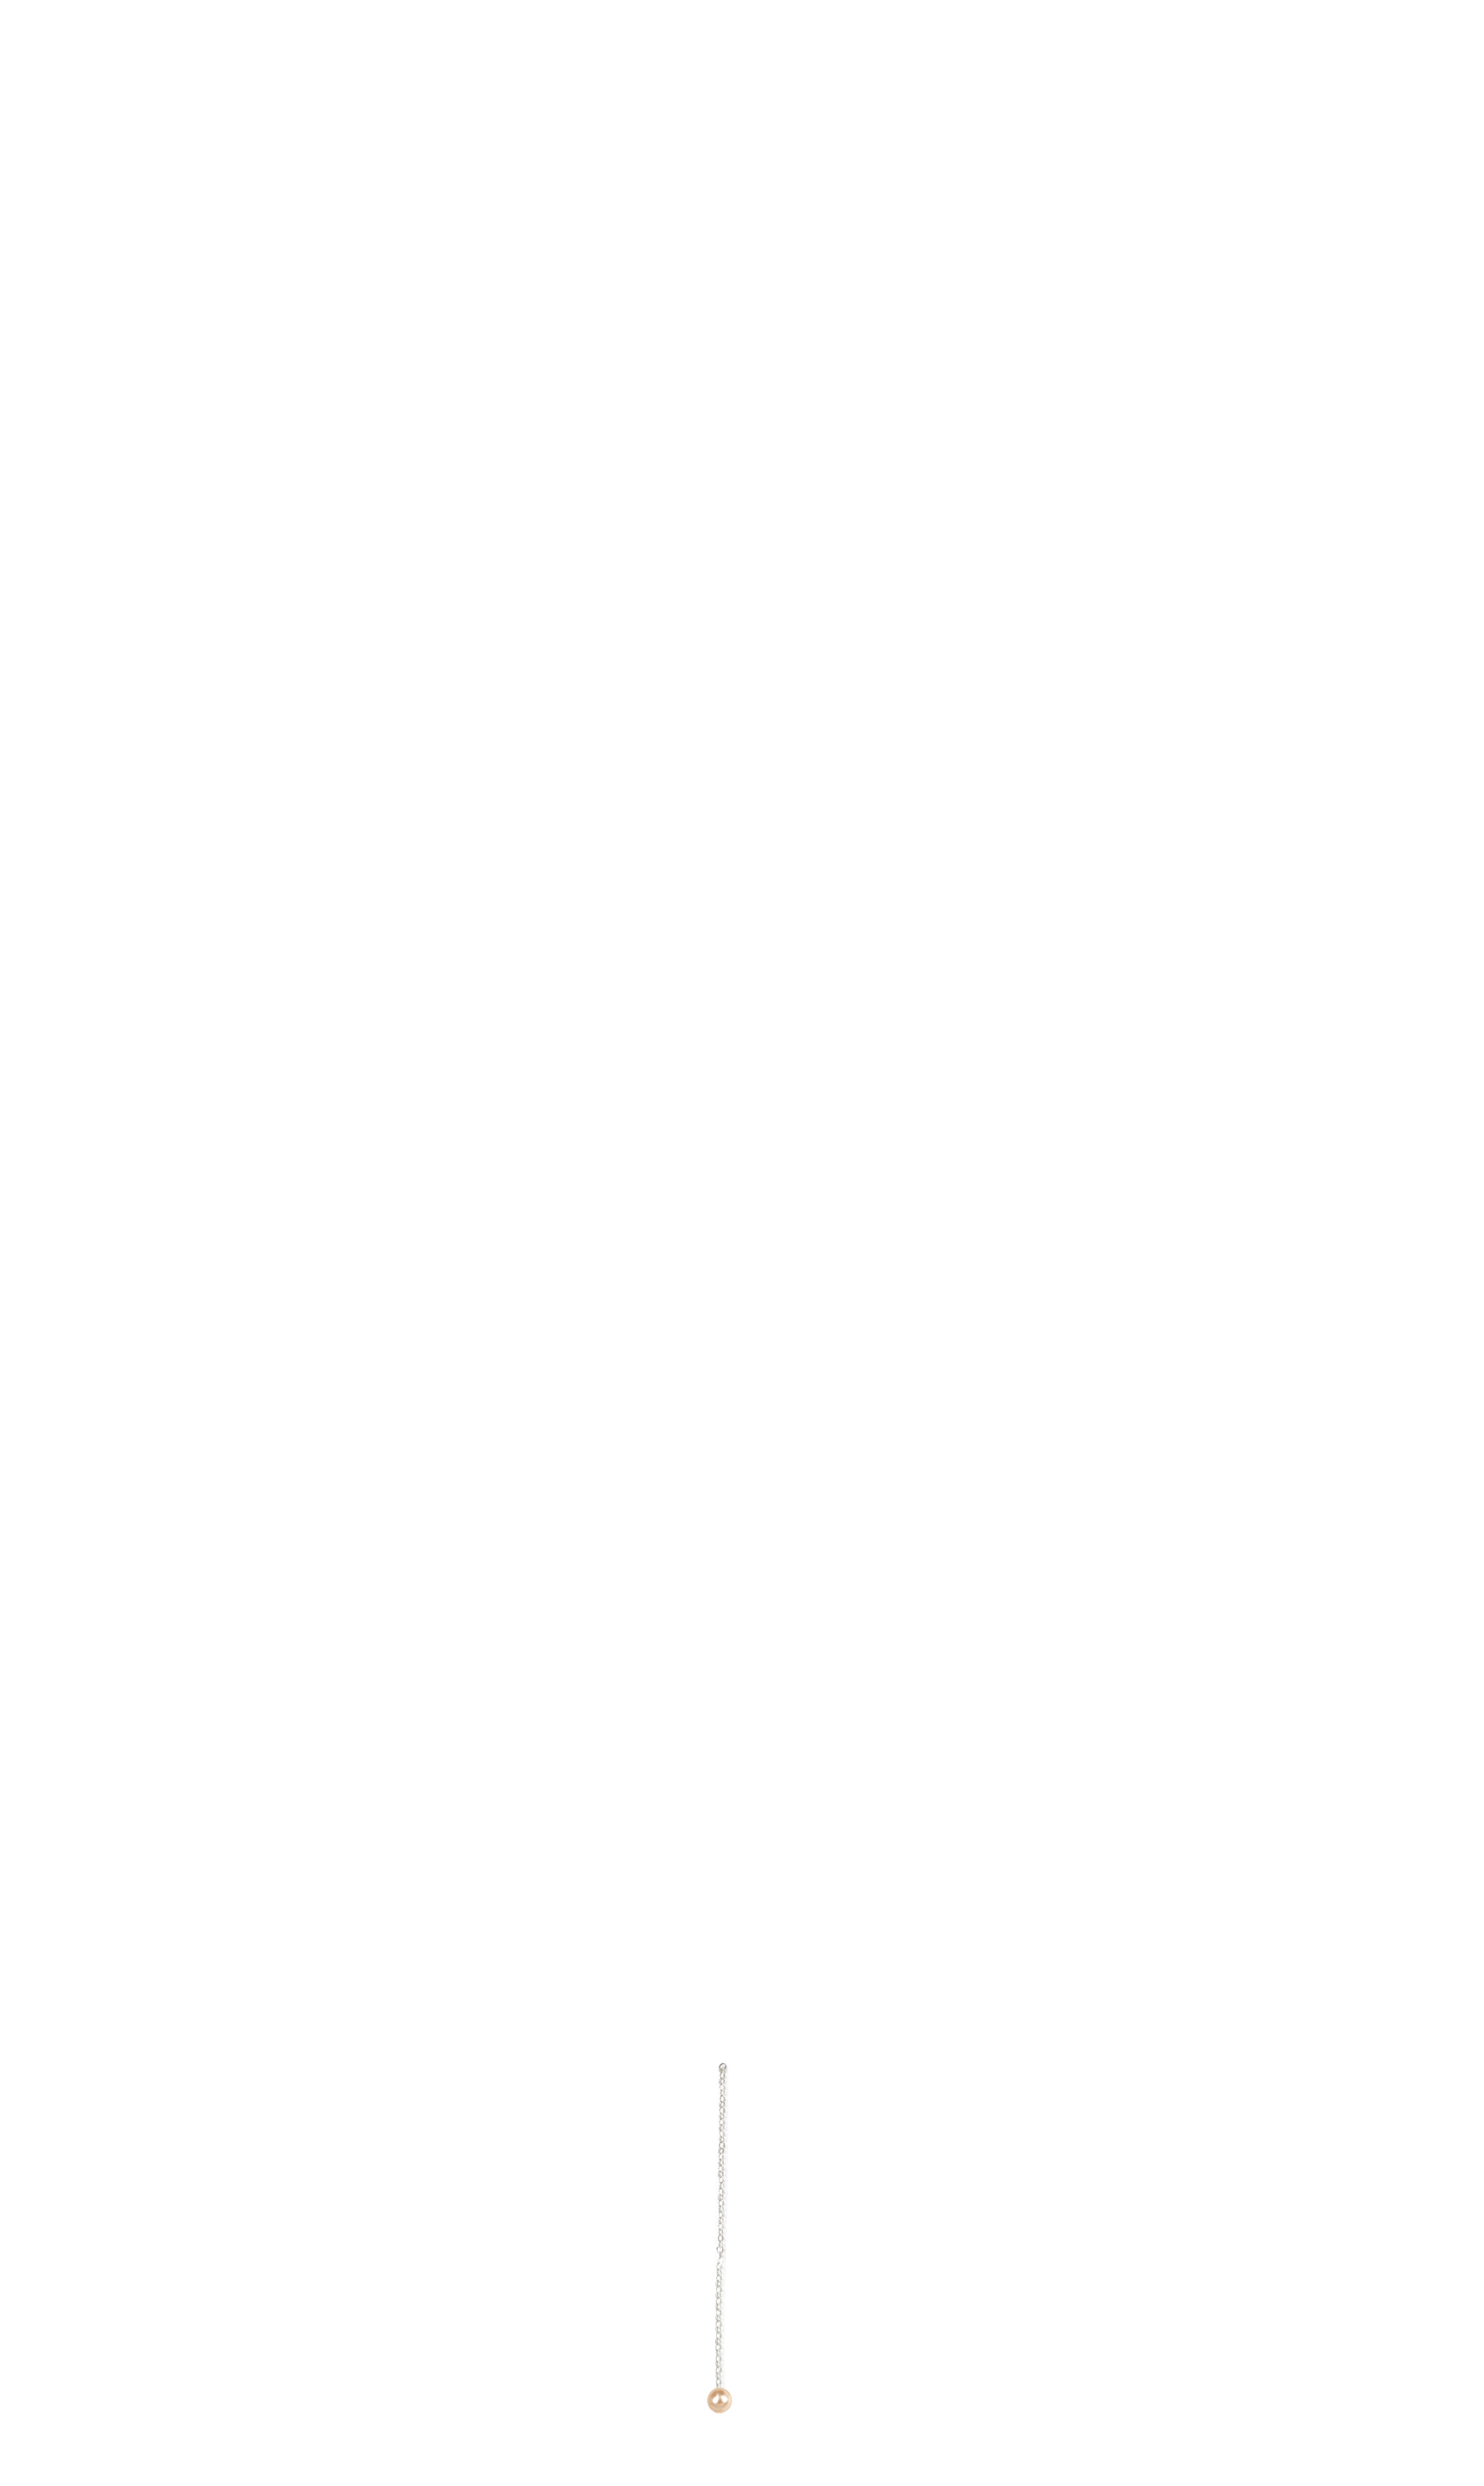 perle Swarovski 6 mm bas rose poudré